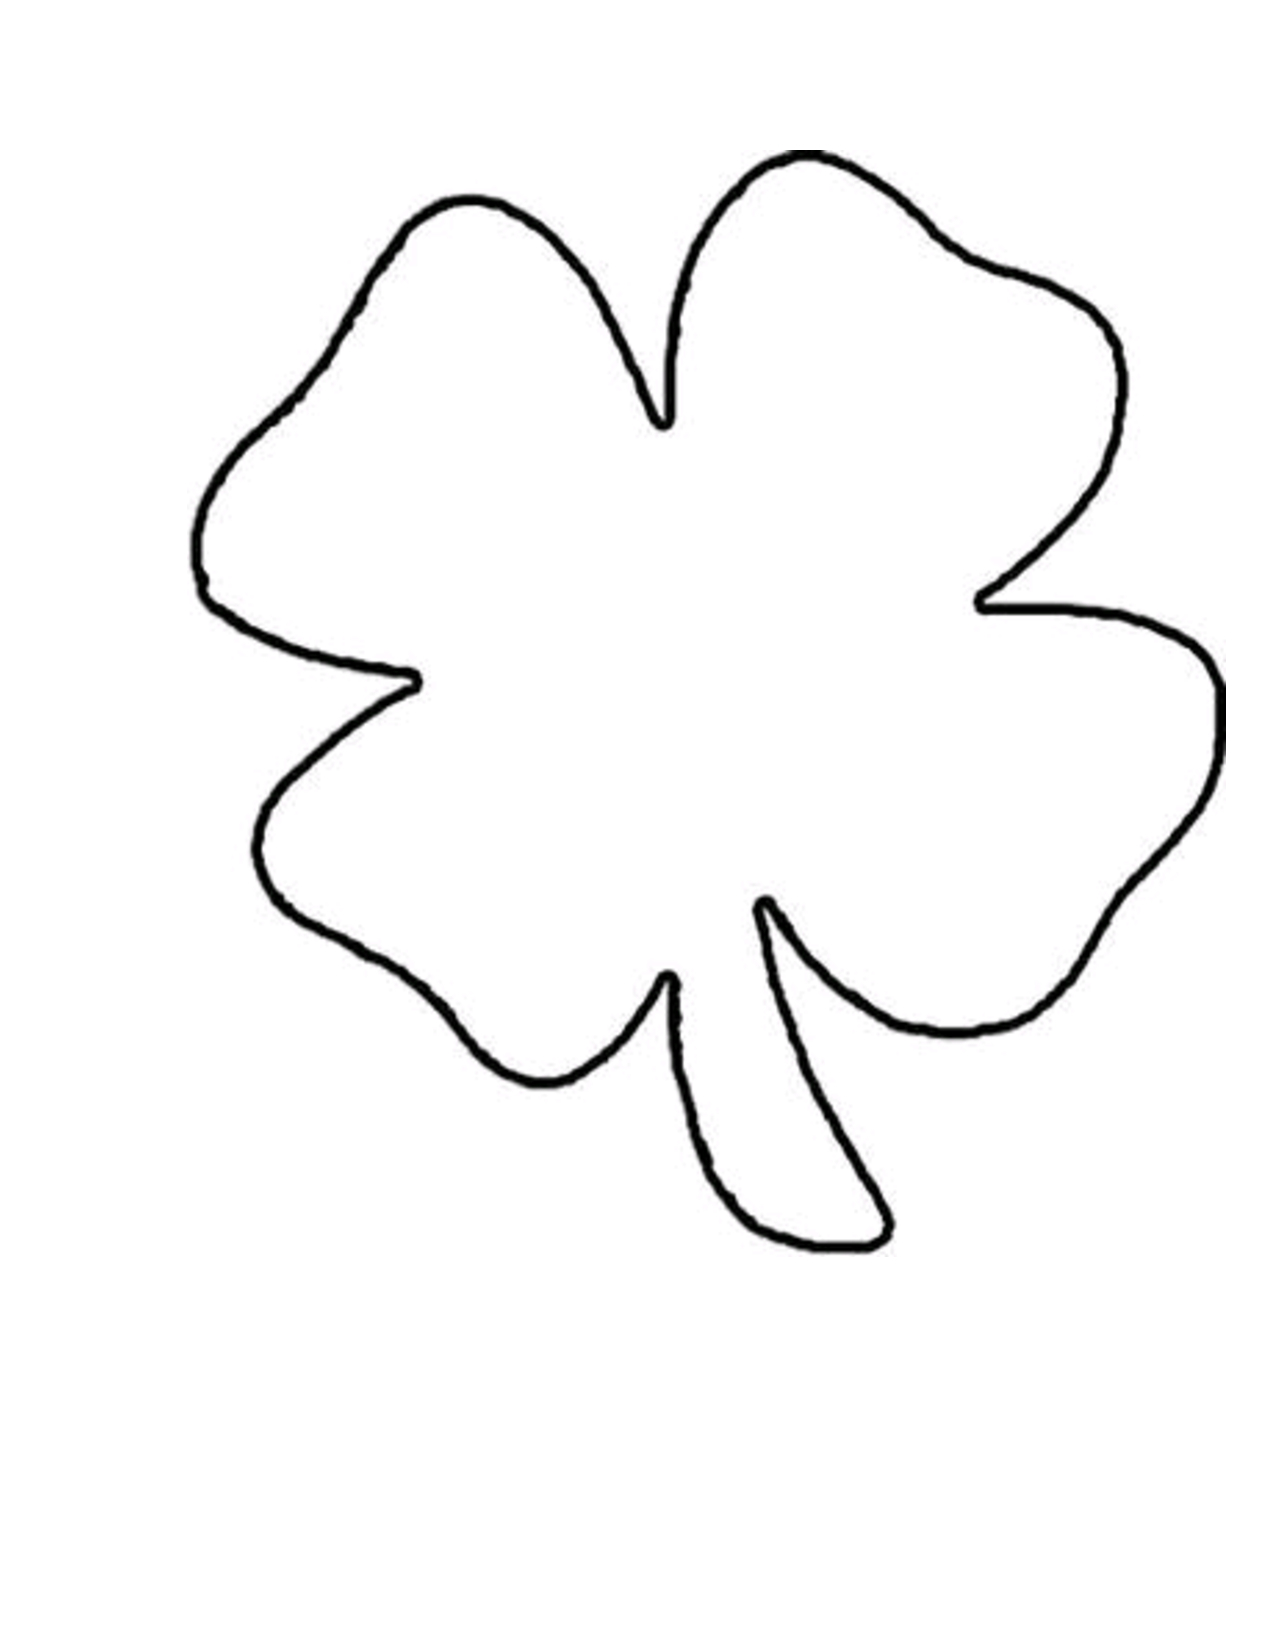 Shamrock Templates Printable | Shamrock Template | Crafts | Shamrock - Four Leaf Clover Template Printable Free